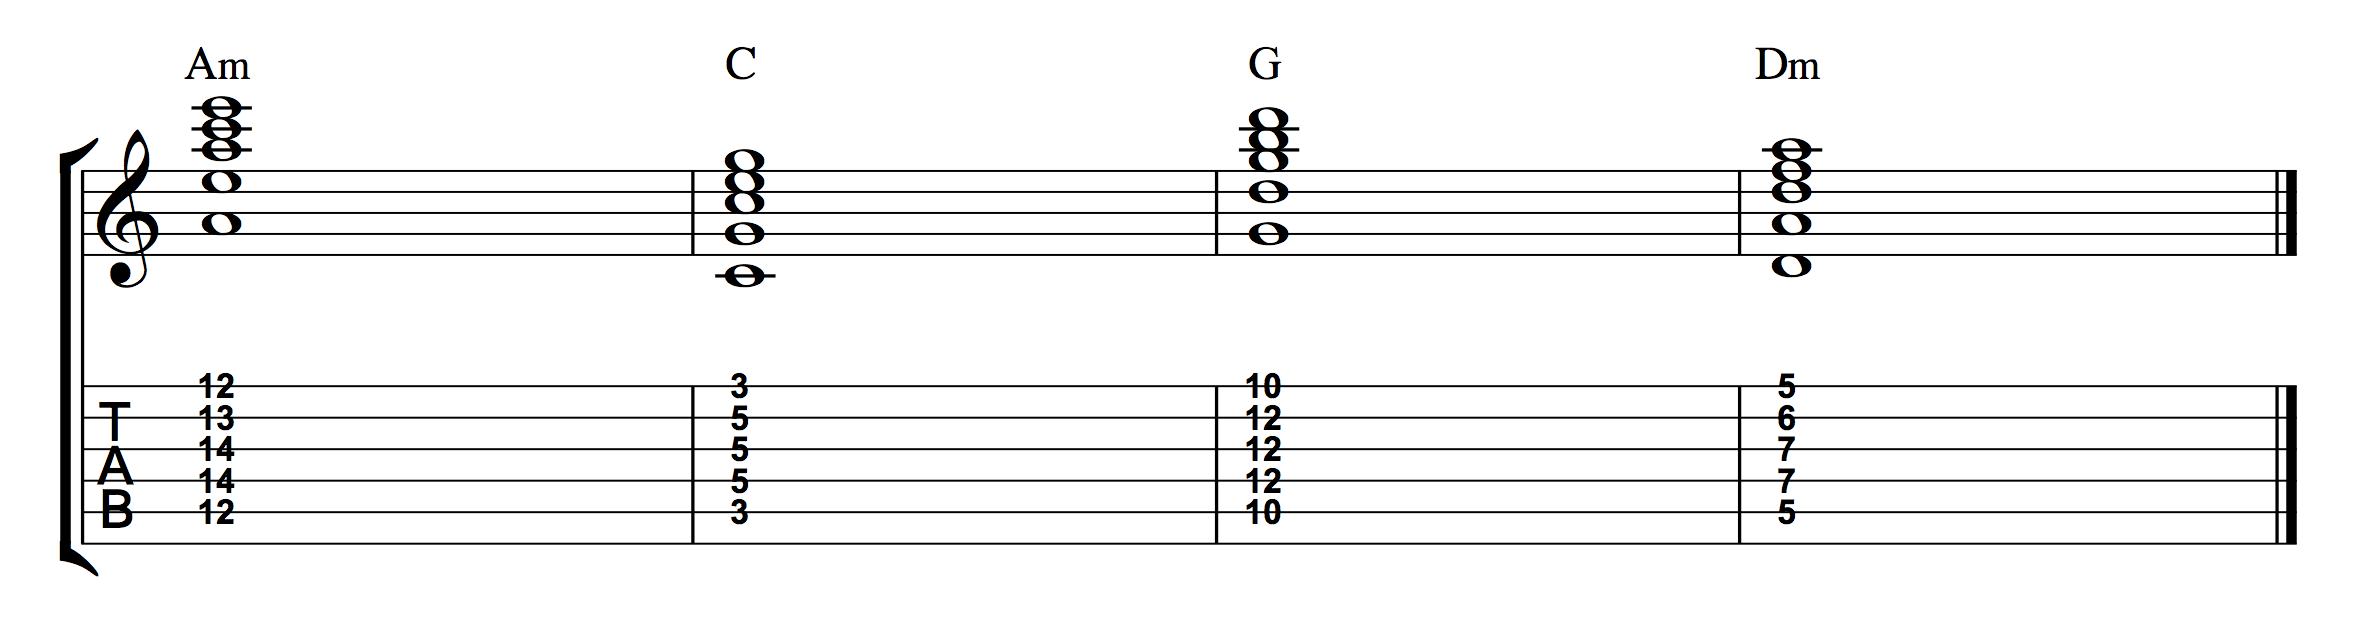 Chord Ex 2 - Demo 2